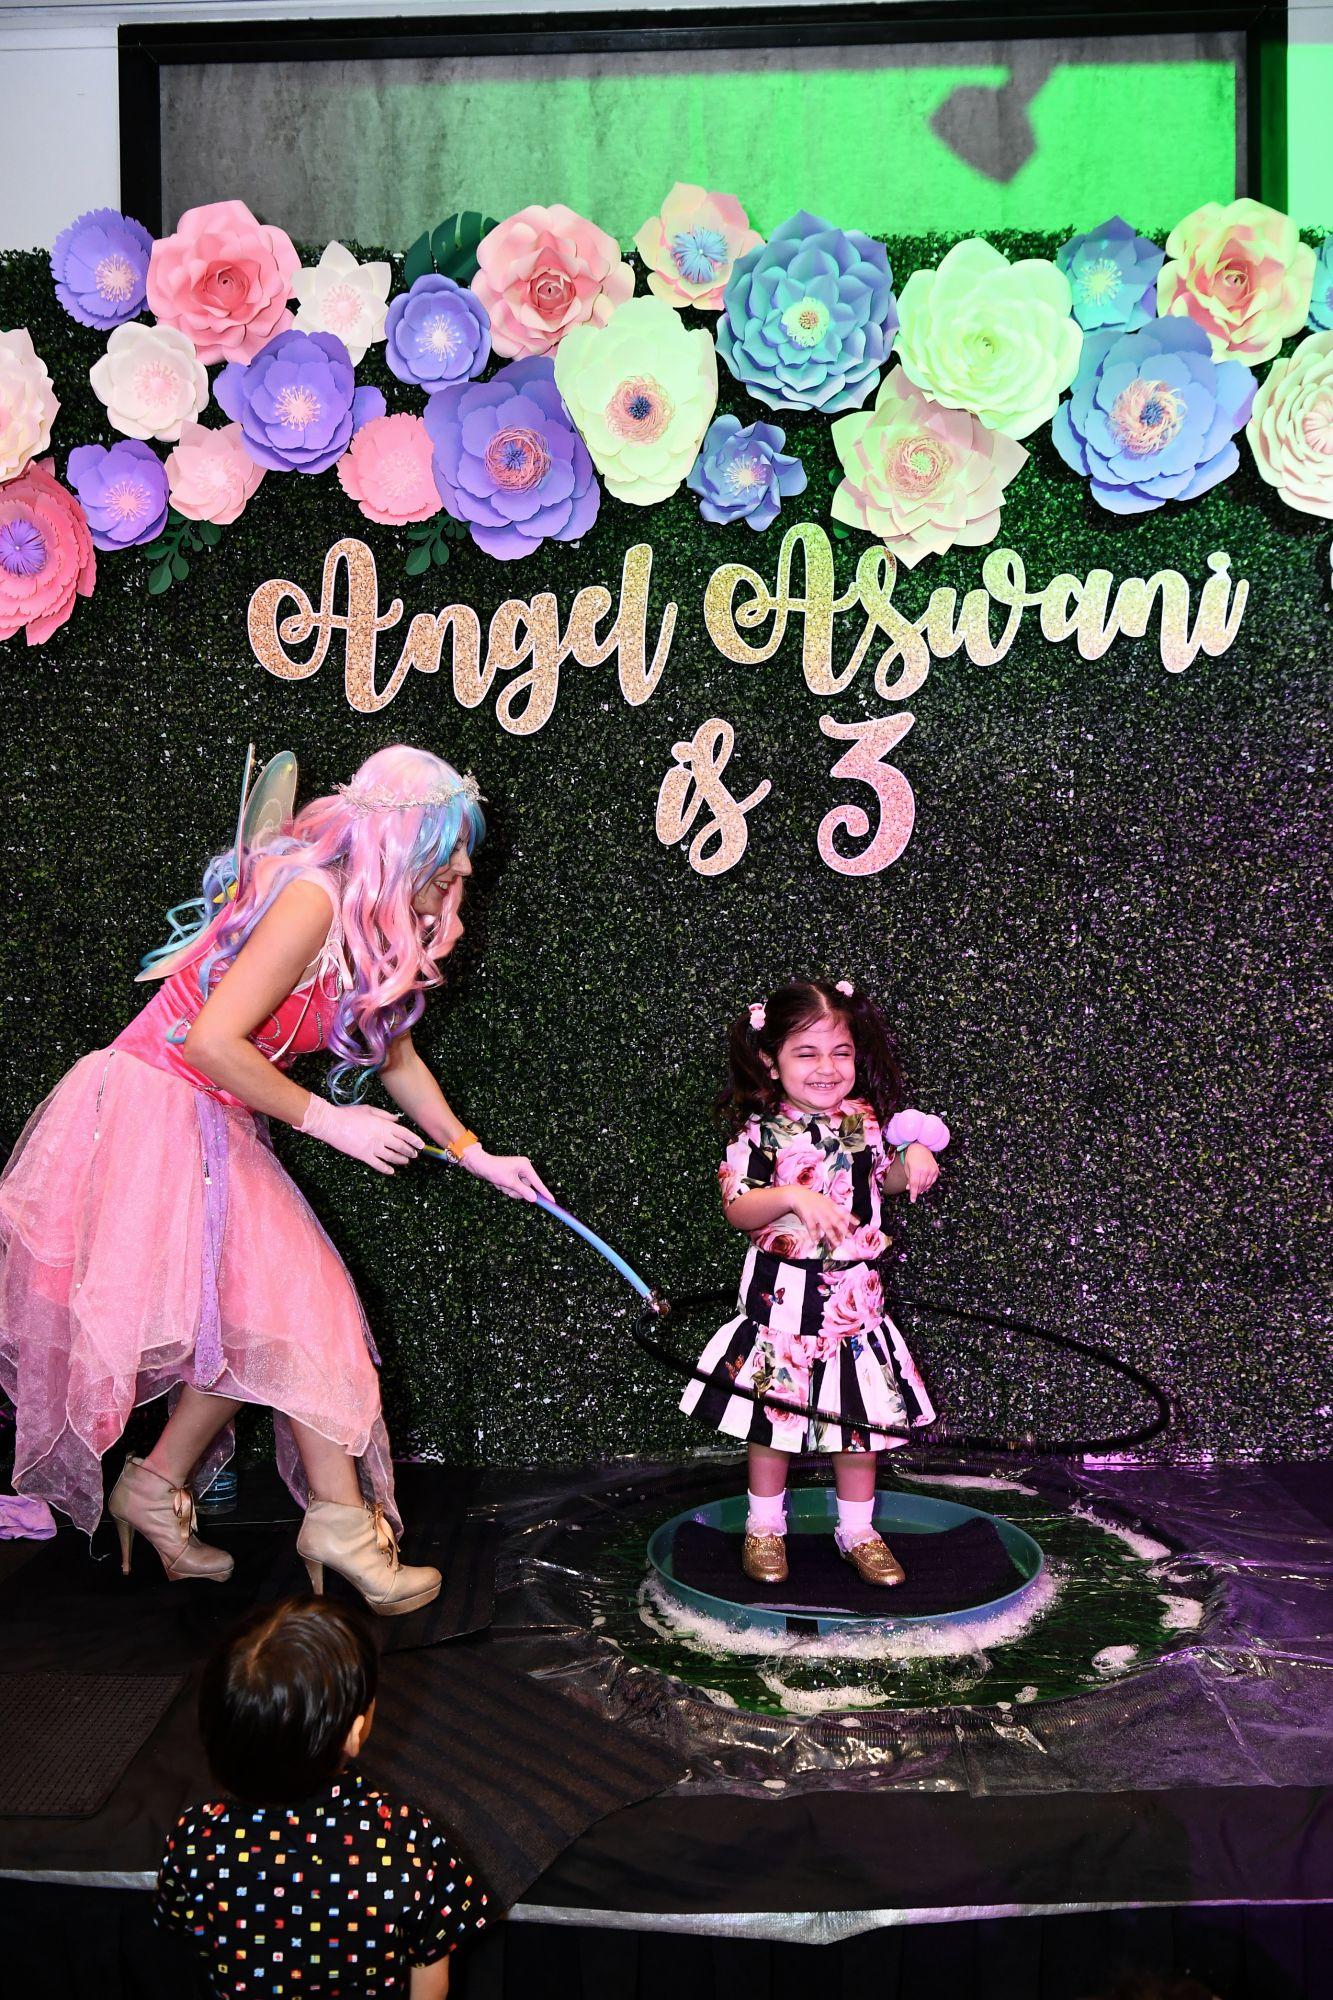 Angel Aswani